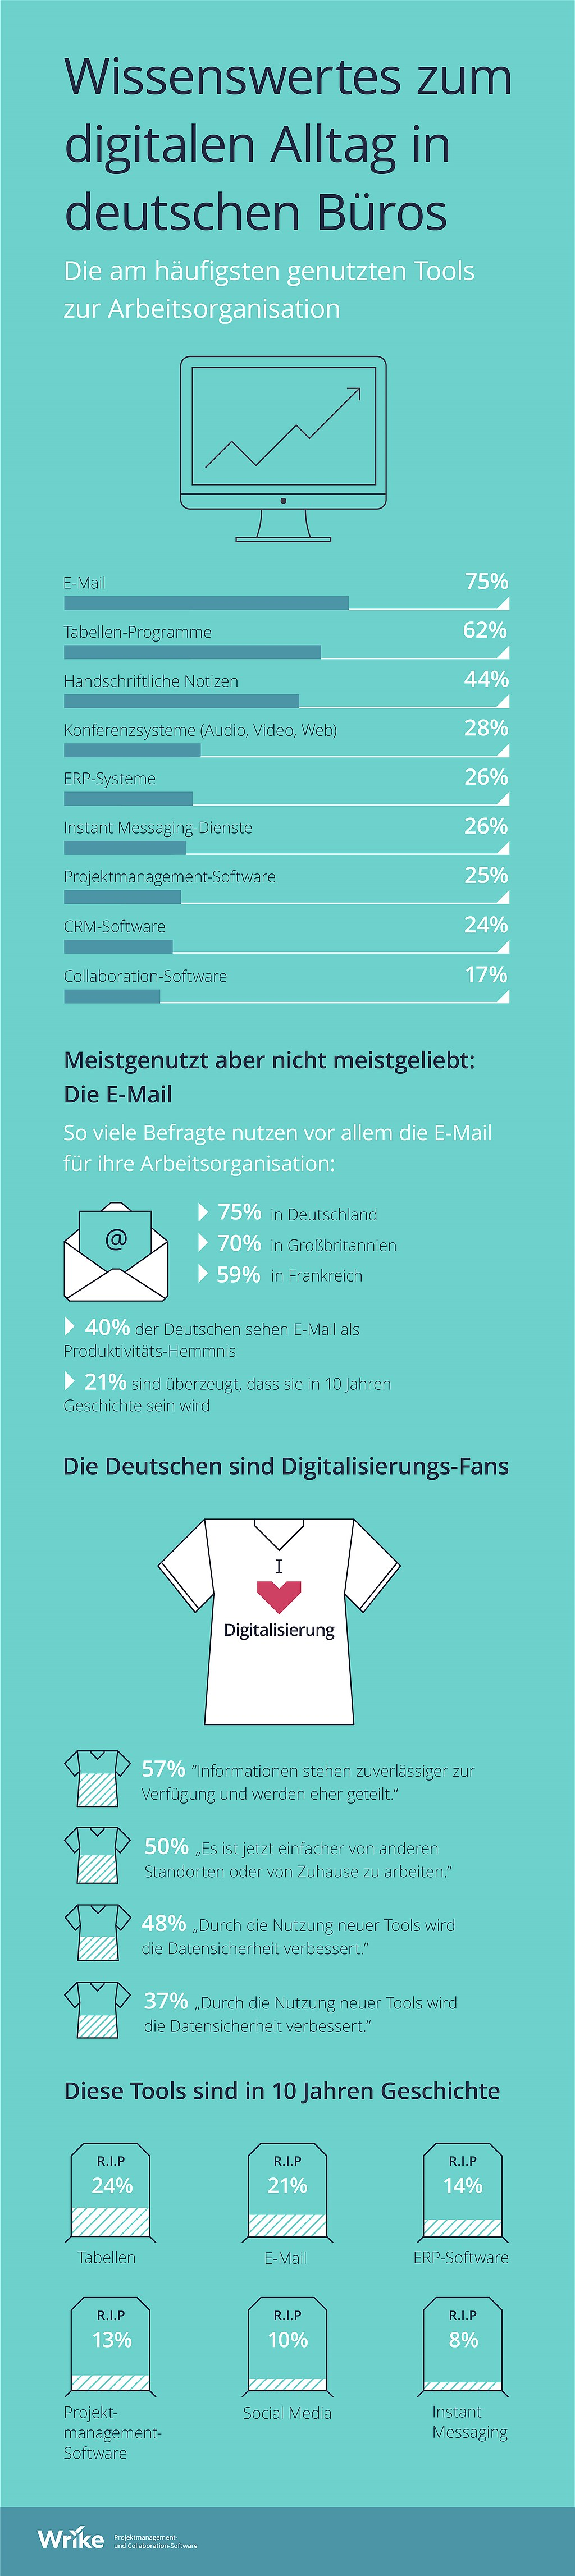 infografik-wrike-tools-organisation-buero